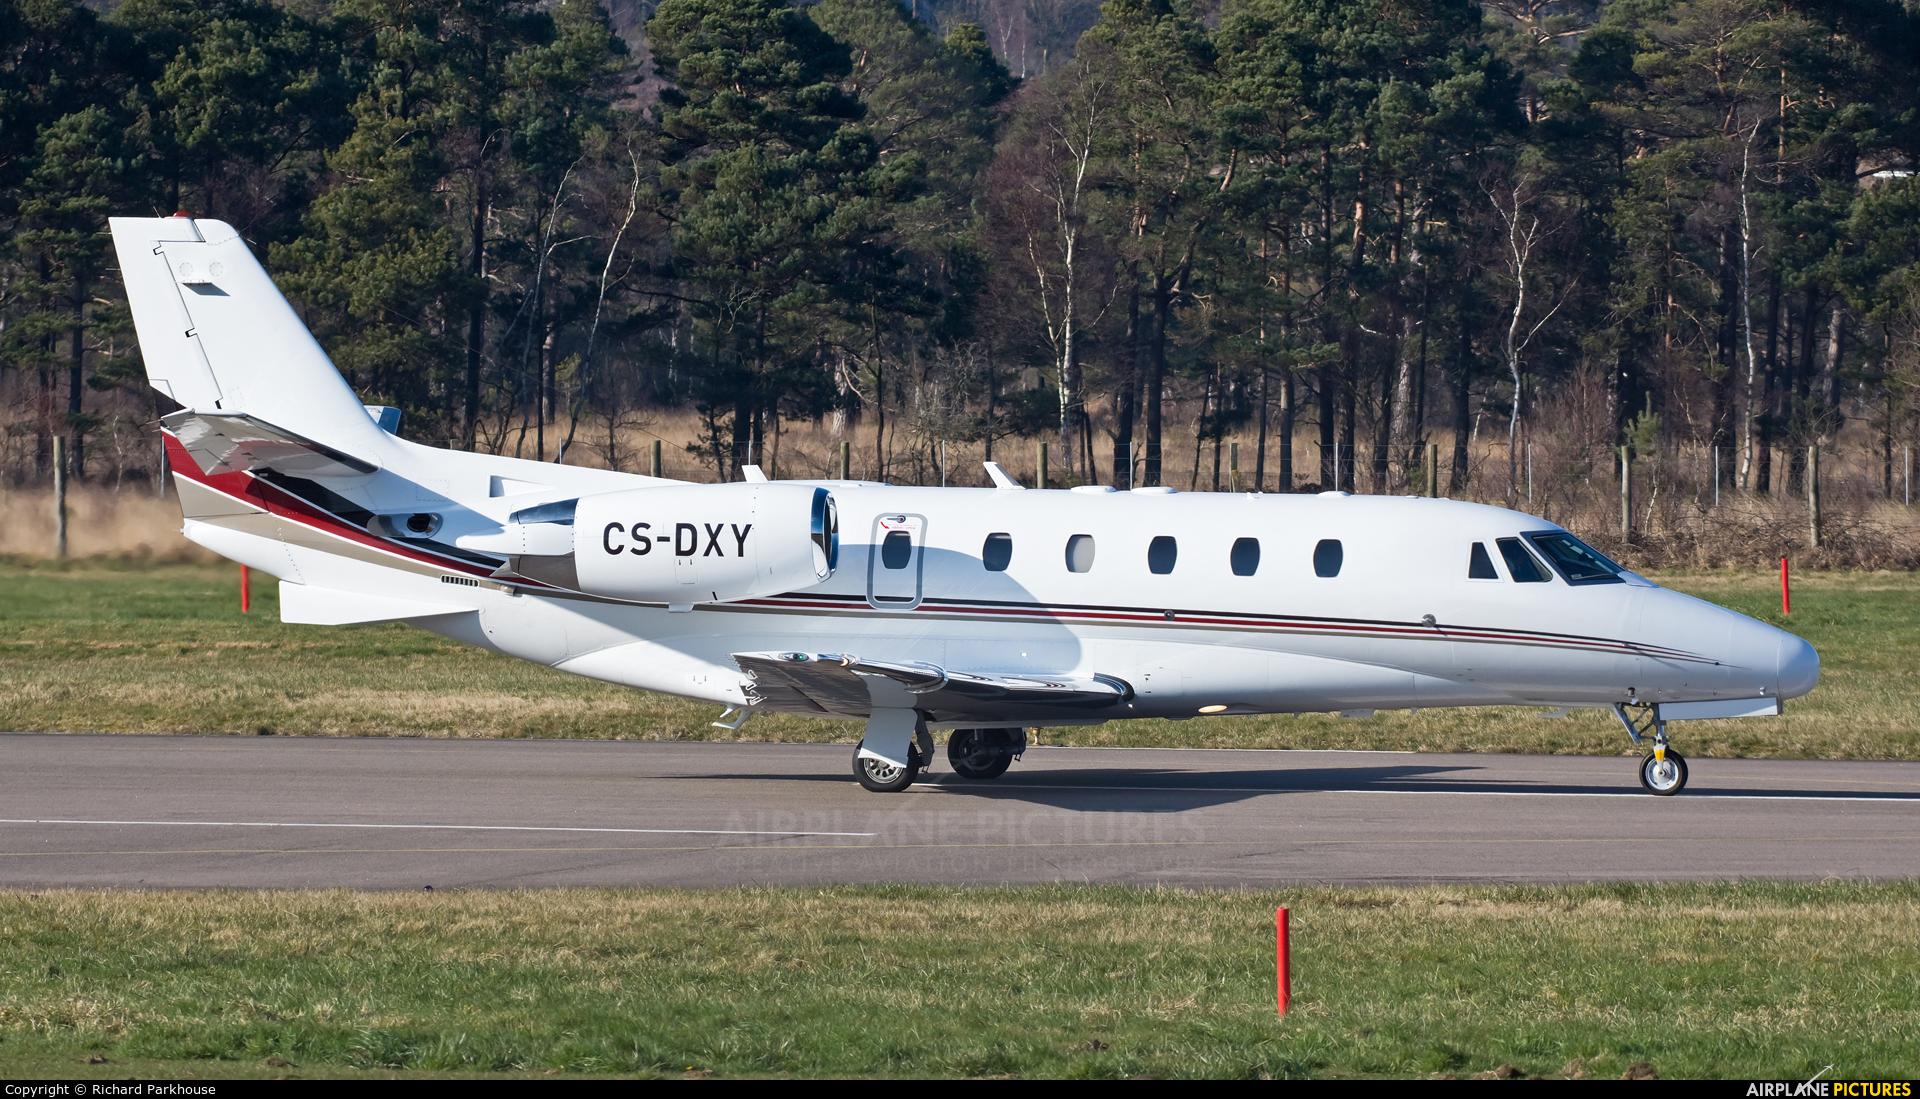 NetJets Europe (Portugal) CS-DXY aircraft at Farnborough